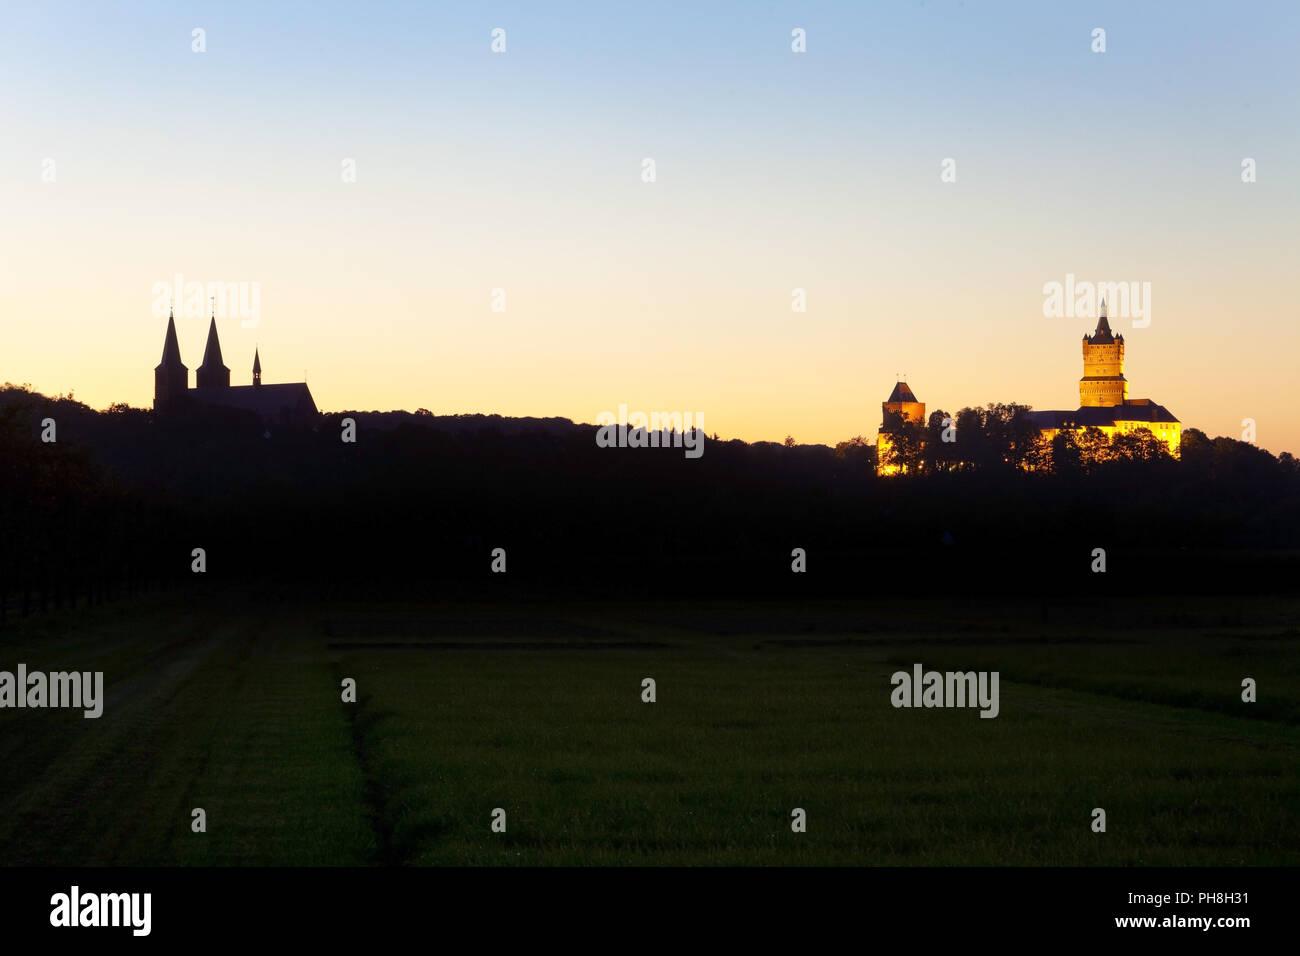 Stiftskirche con Schwanenburg illuminato, Kleve Immagini Stock